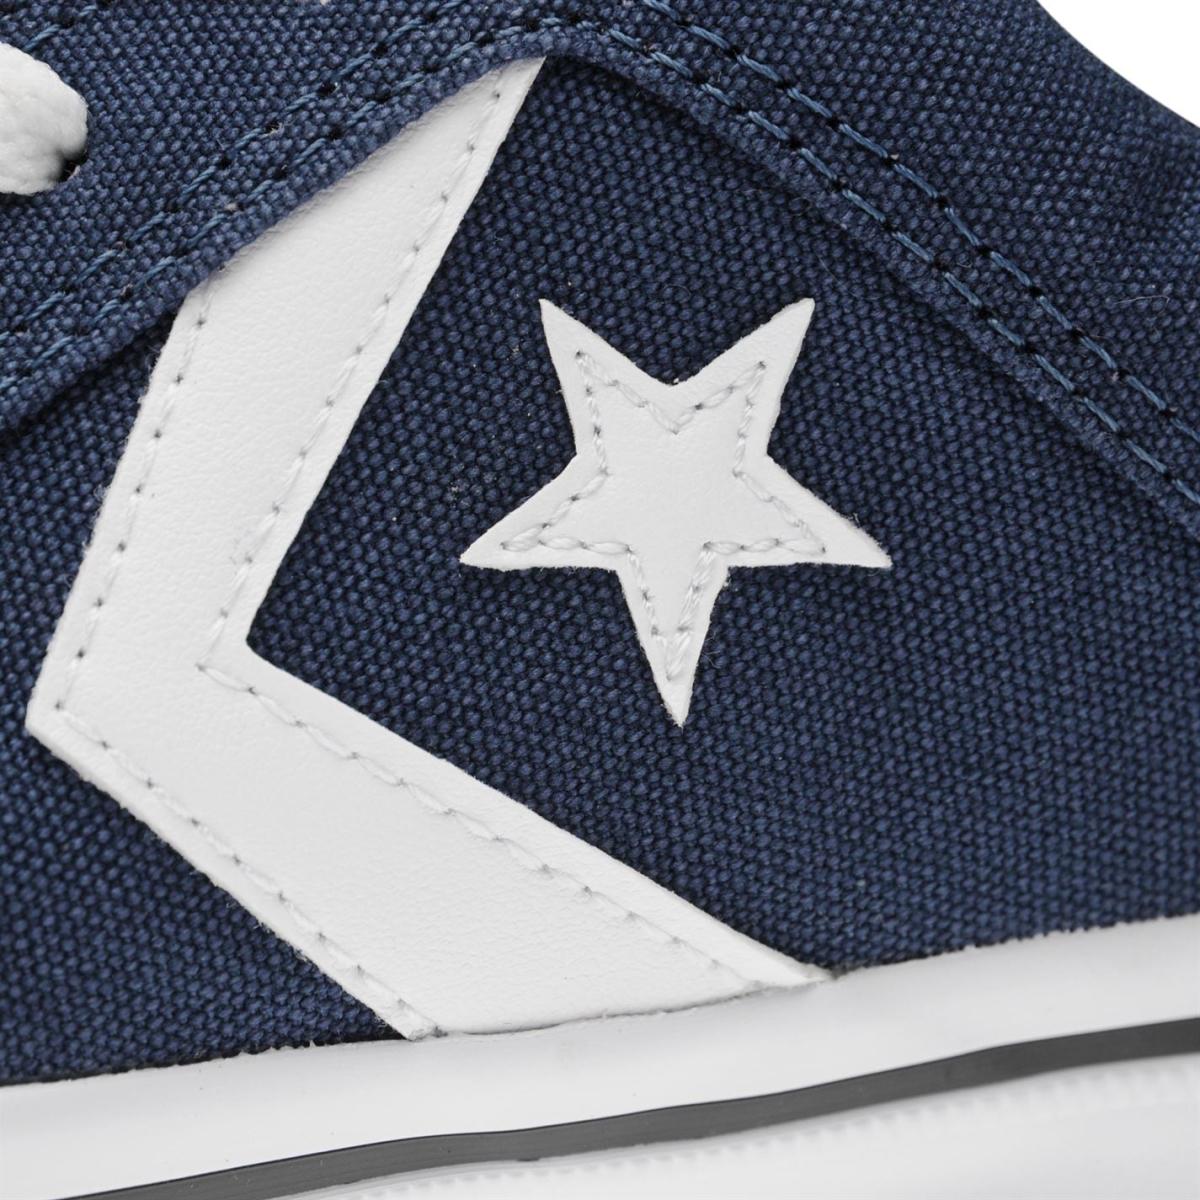 Converse Distrito Turnschuhe Laufschuhe Herren Schuhe Sneakers Trainers Canvas 1